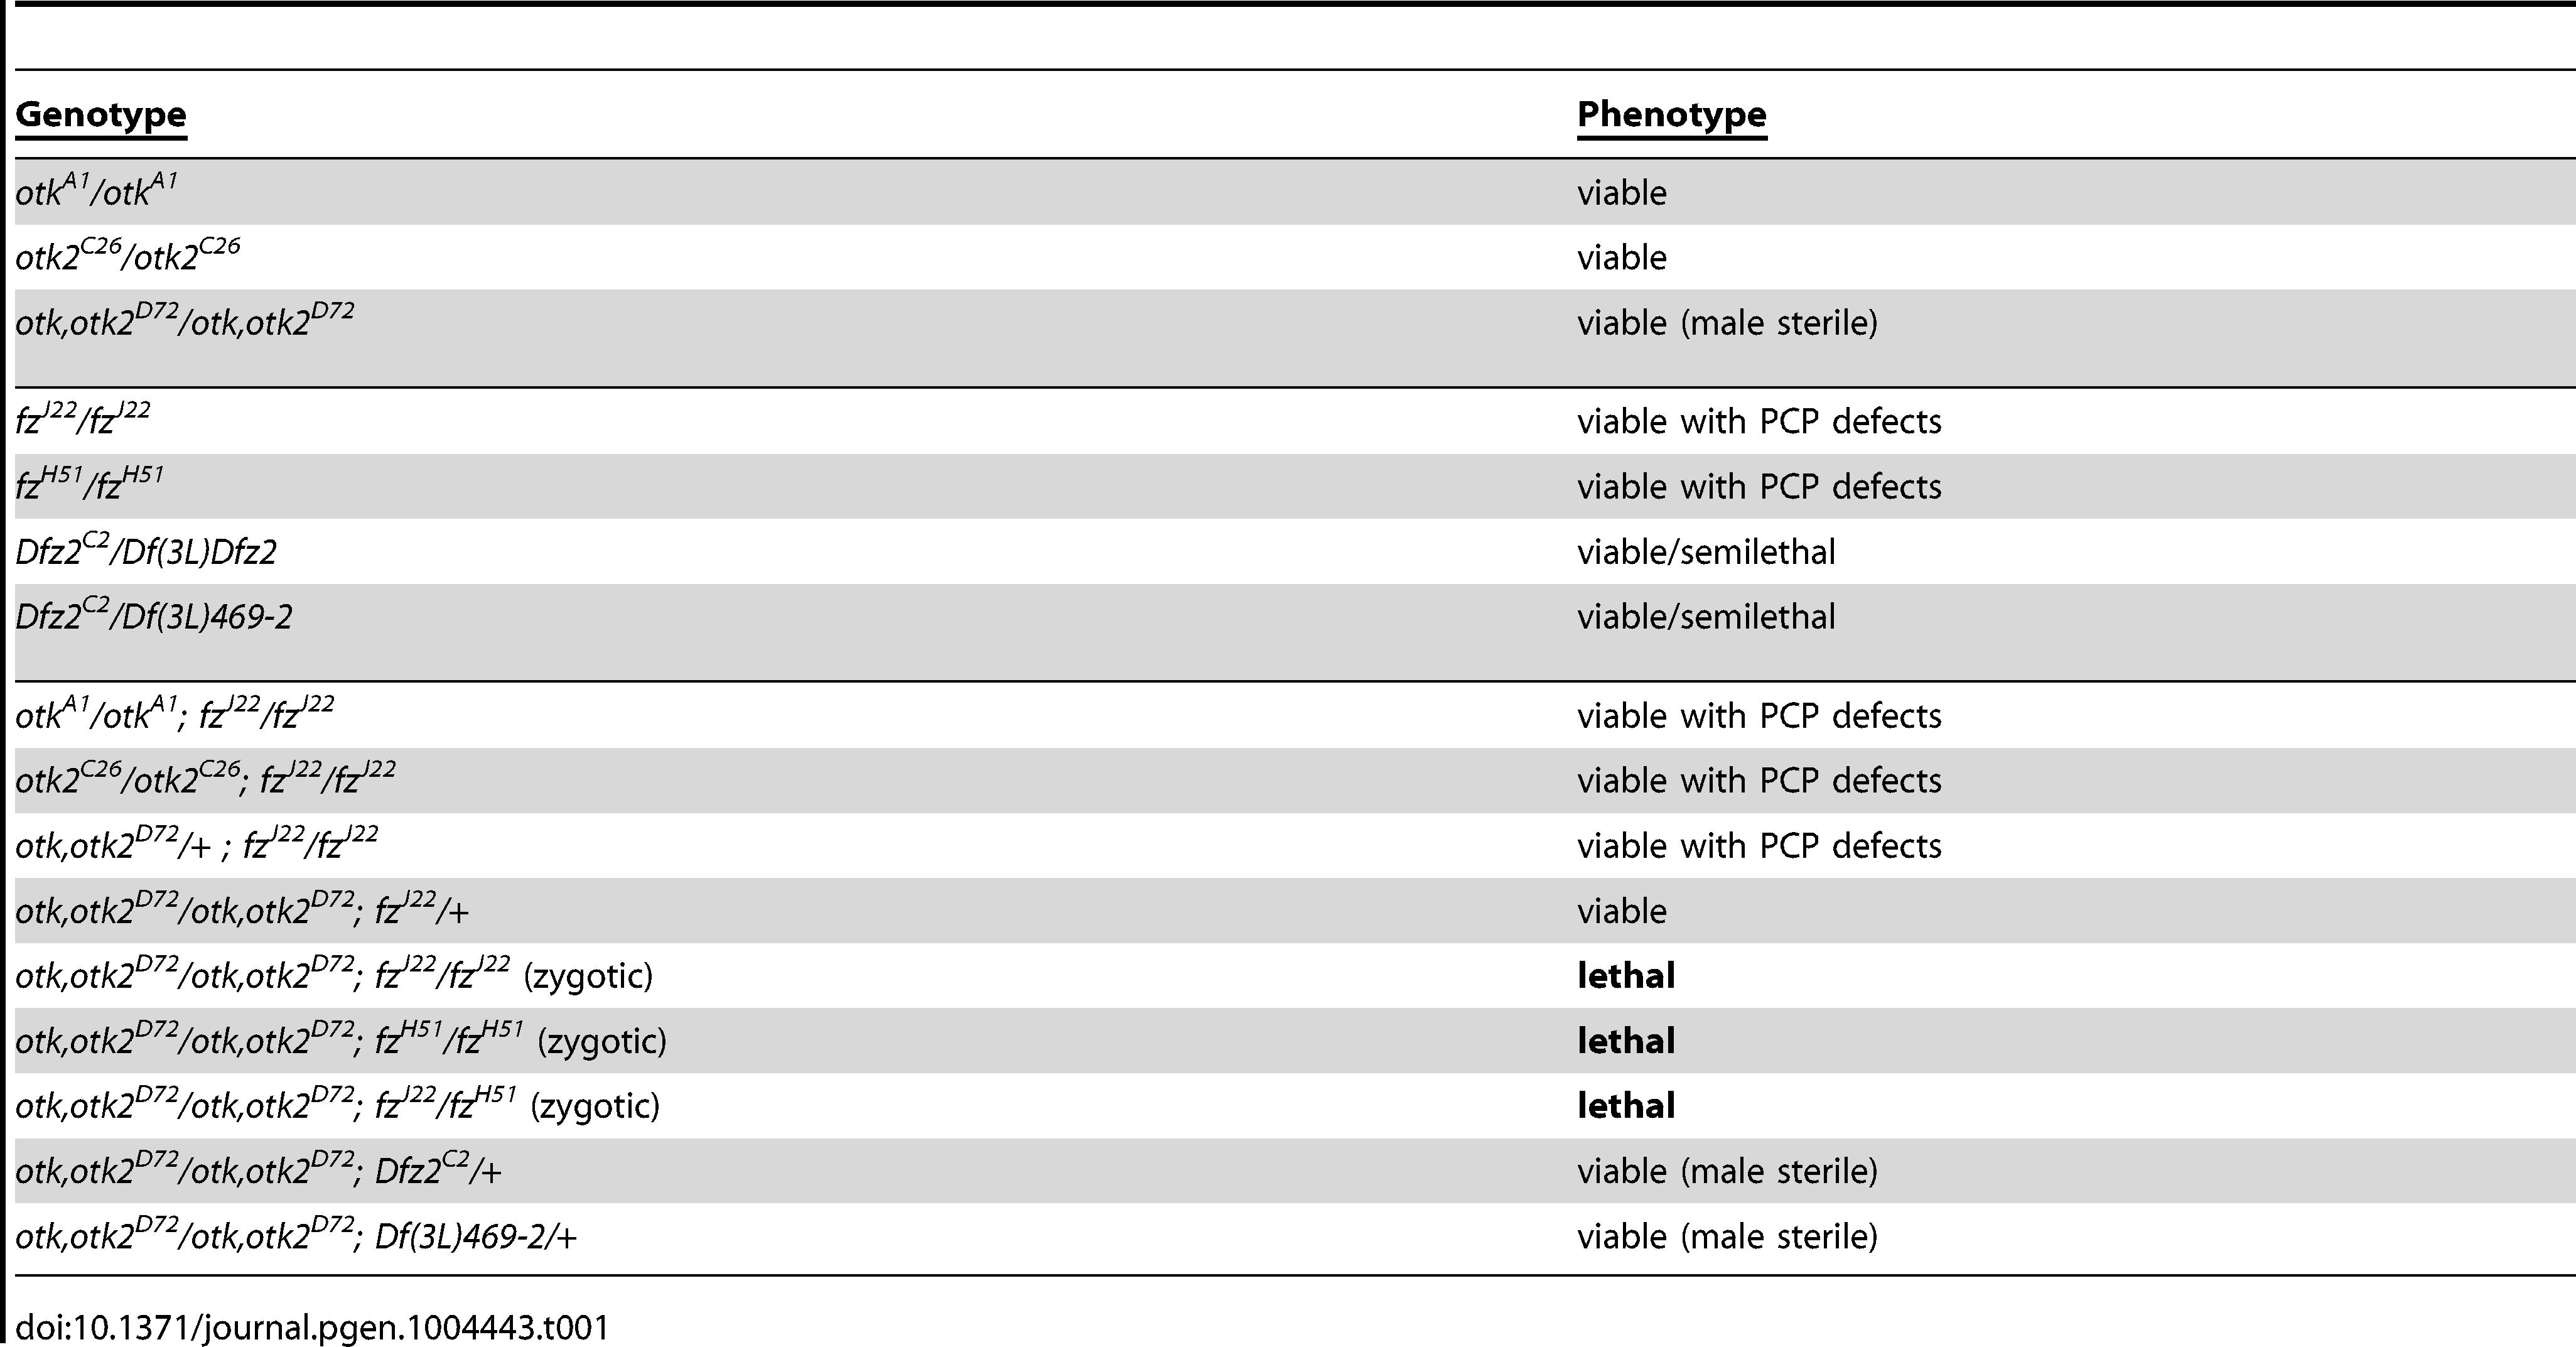 The <i>otk, otk2<sup>D72</sup></i> double mutant genetically interacts with <i>fz</i>.